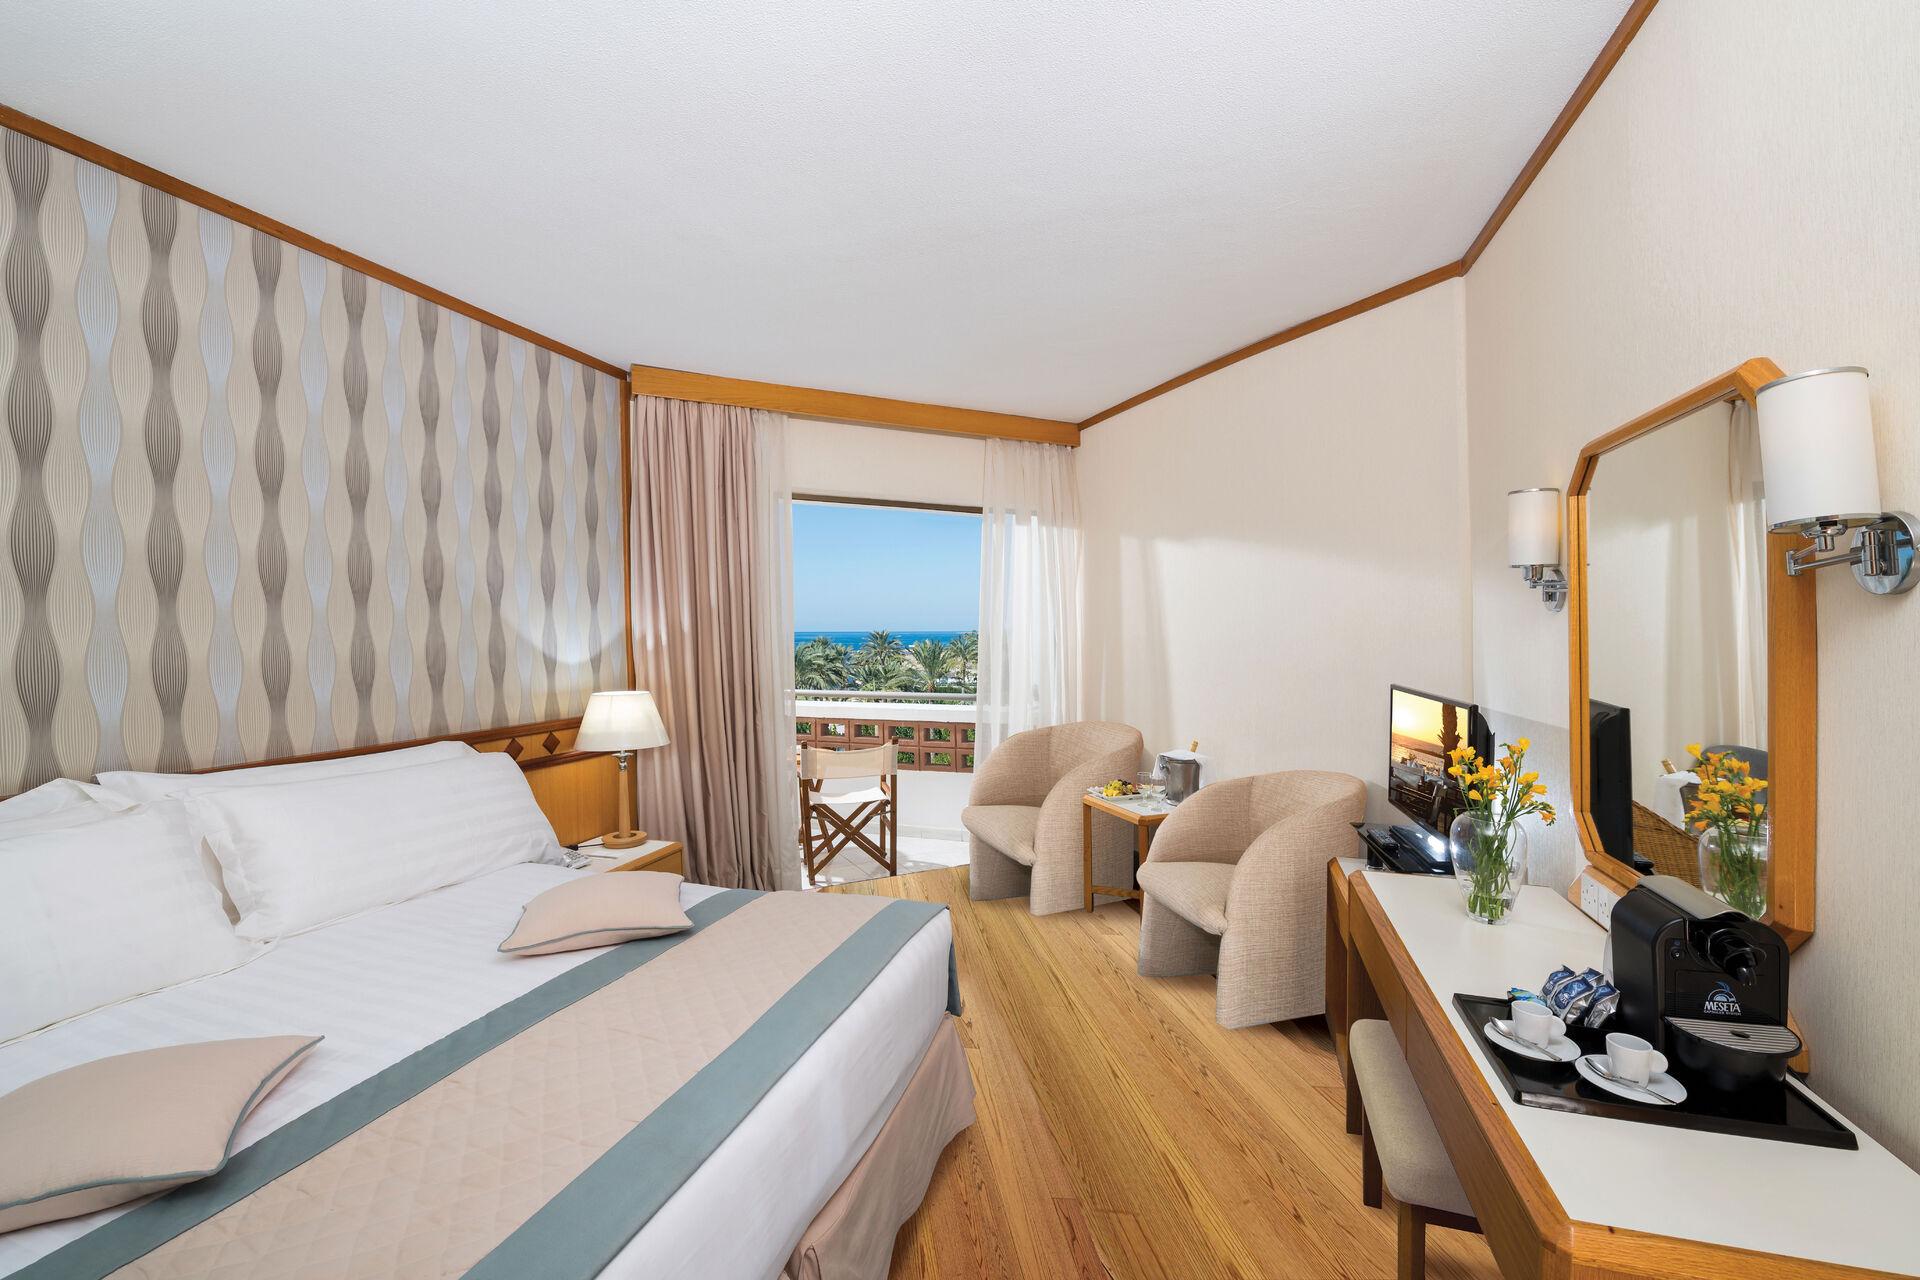 https://cms.satur.sk/data/imgs/tour_image/orig/19-pioneer-beach-hotel-standard-room-sv-1972641.jpg